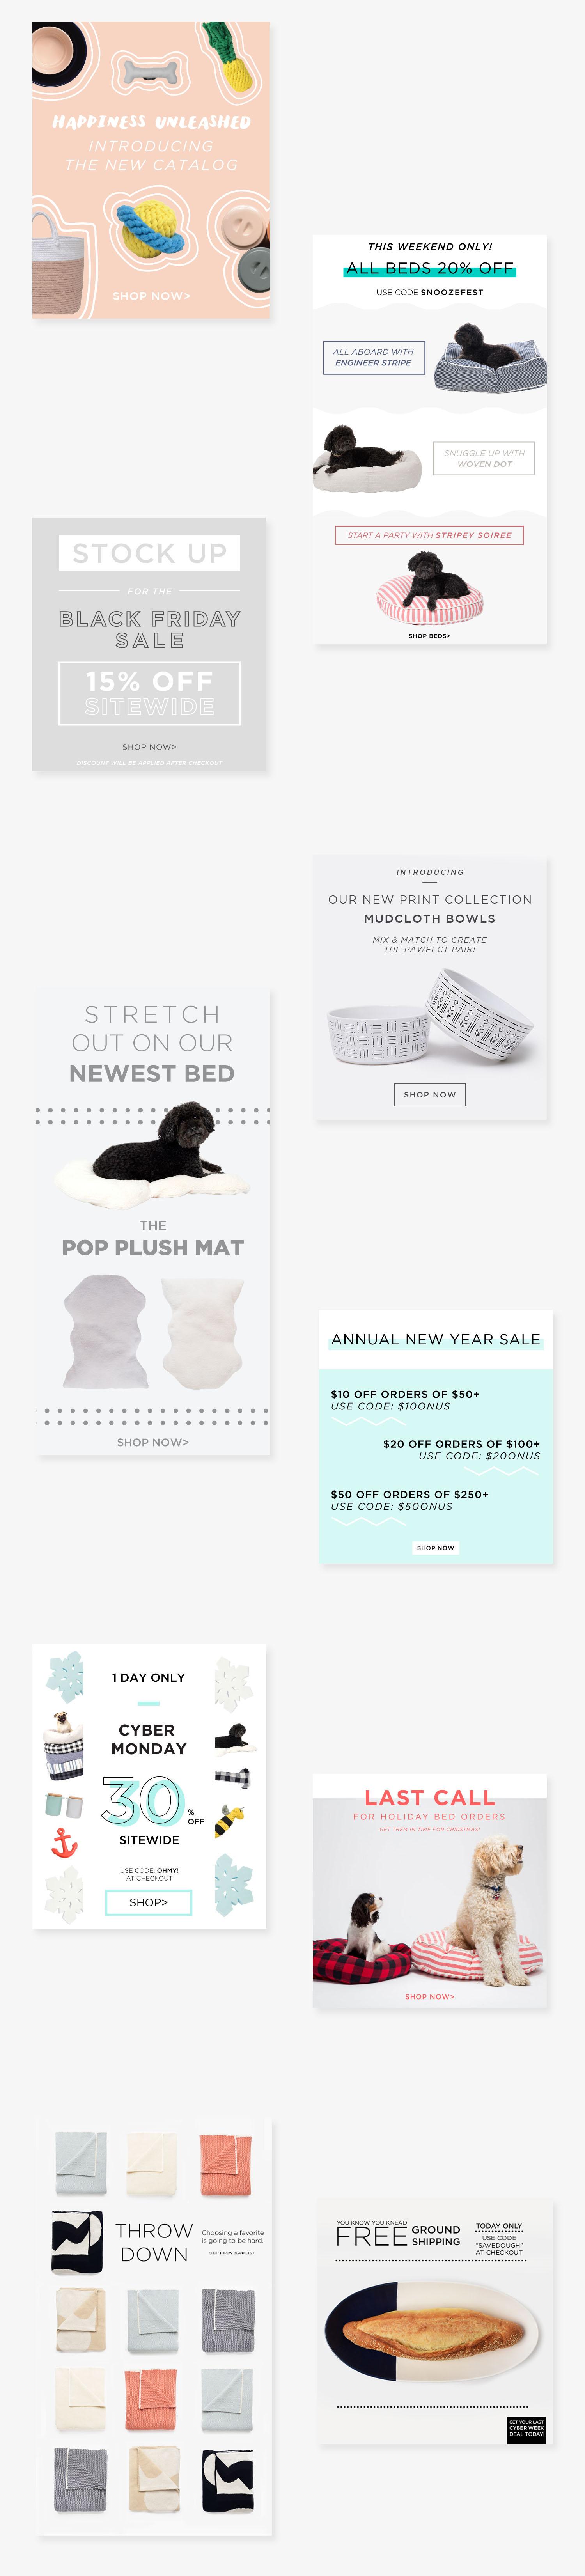 Waggo-Anchor-Toy-Styling-Dog-Pet-Graphic-Designer-Heather-Maehr.jpg